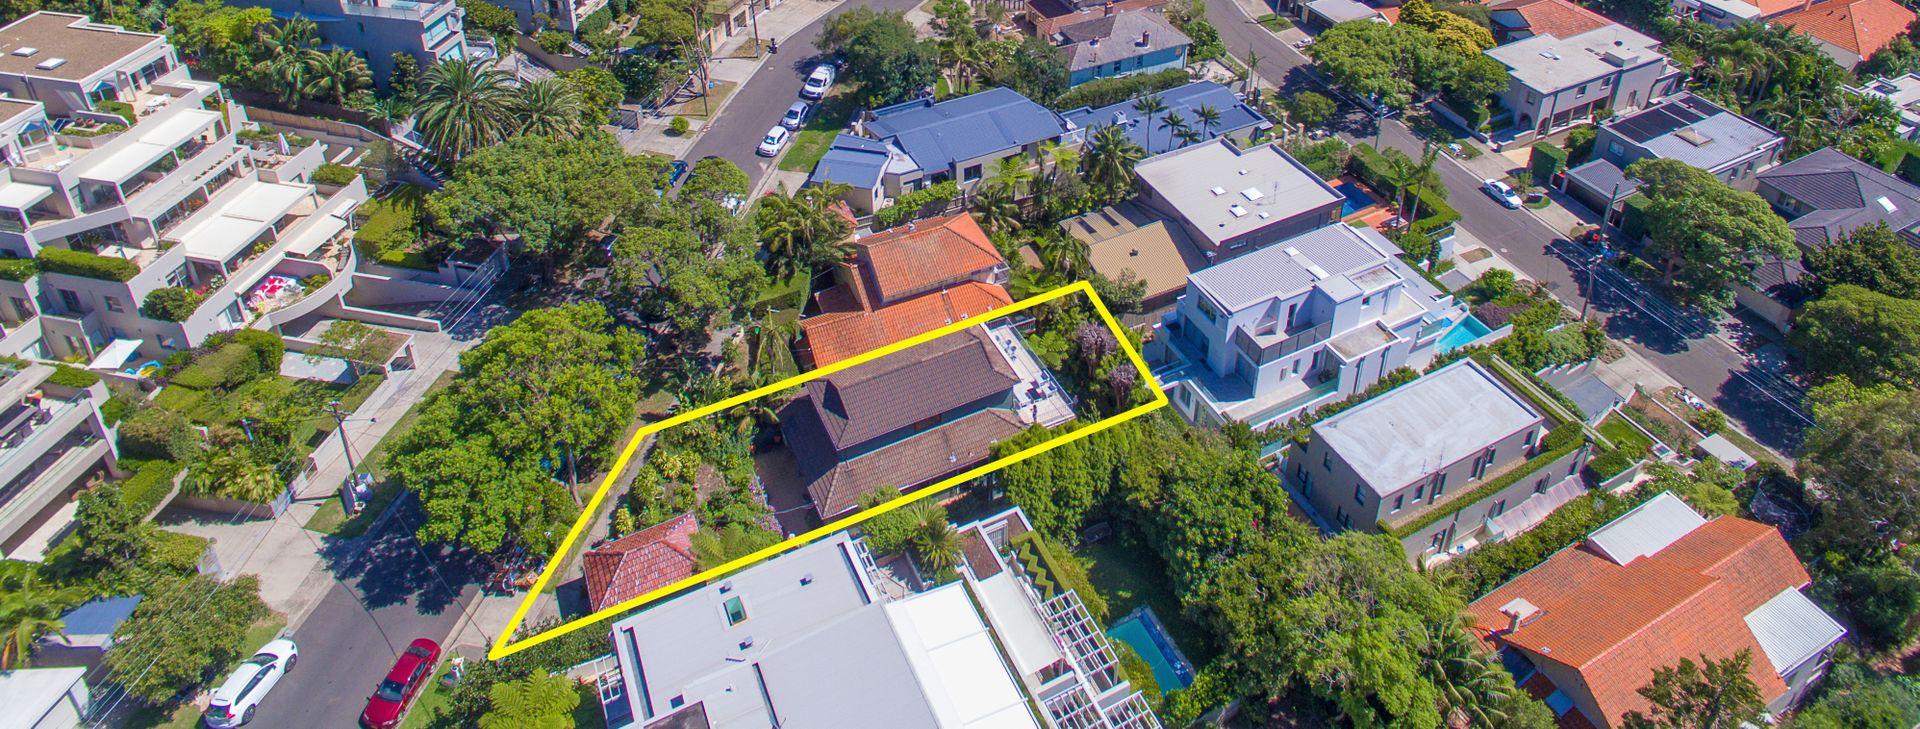 45 Benelong Crescent, Bellevue Hill NSW 2023, Image 0